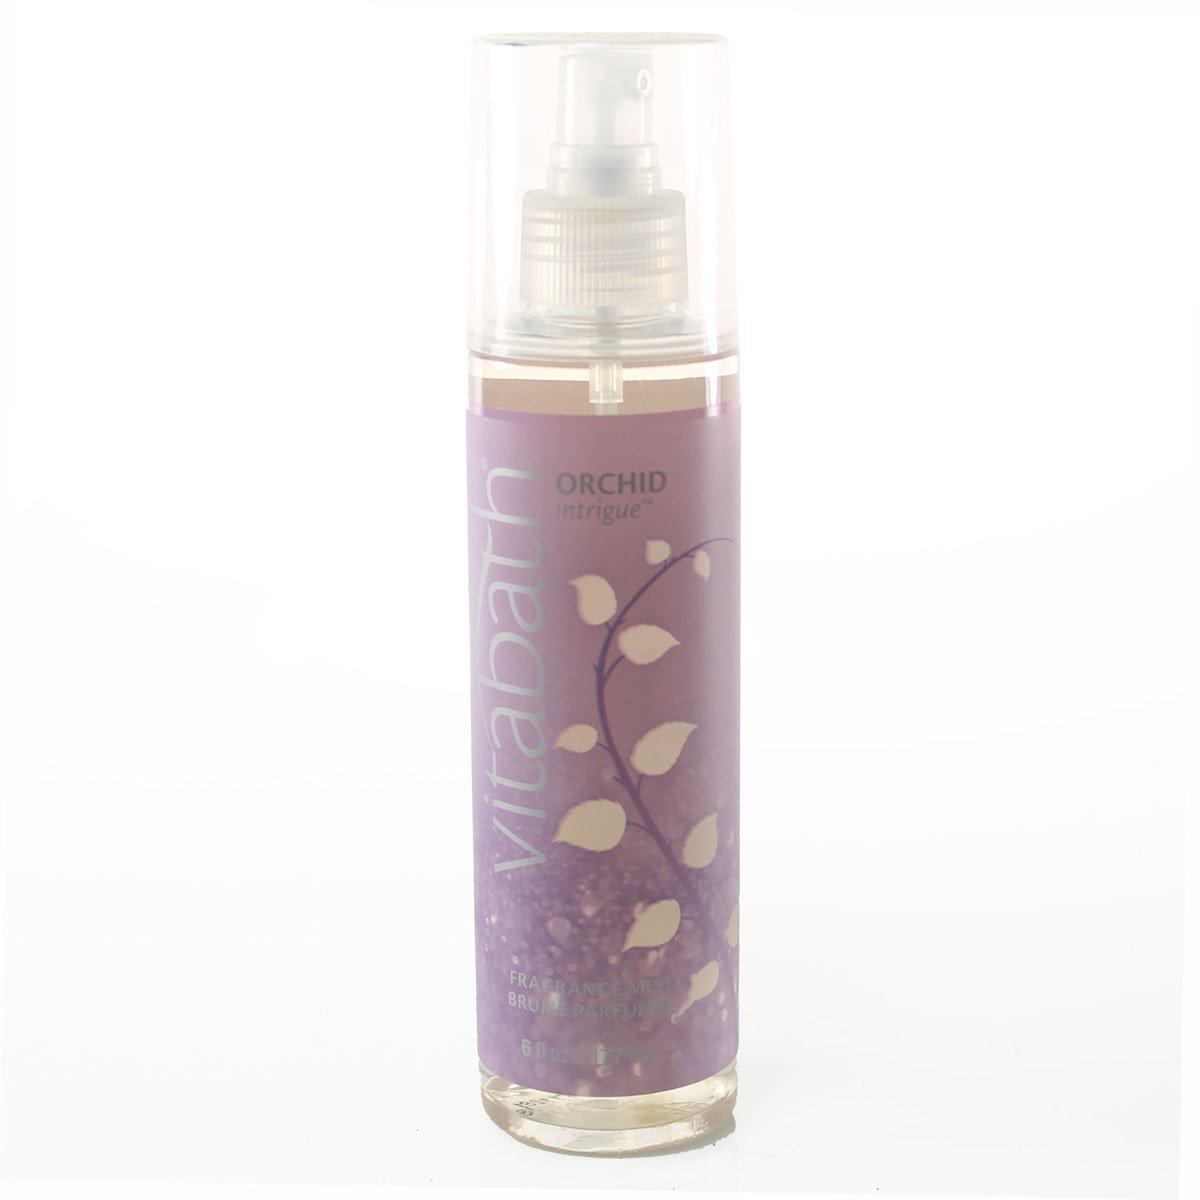 Vitabath Orchid Intrigue Fragrance Mist (6 oz, 177 ml)